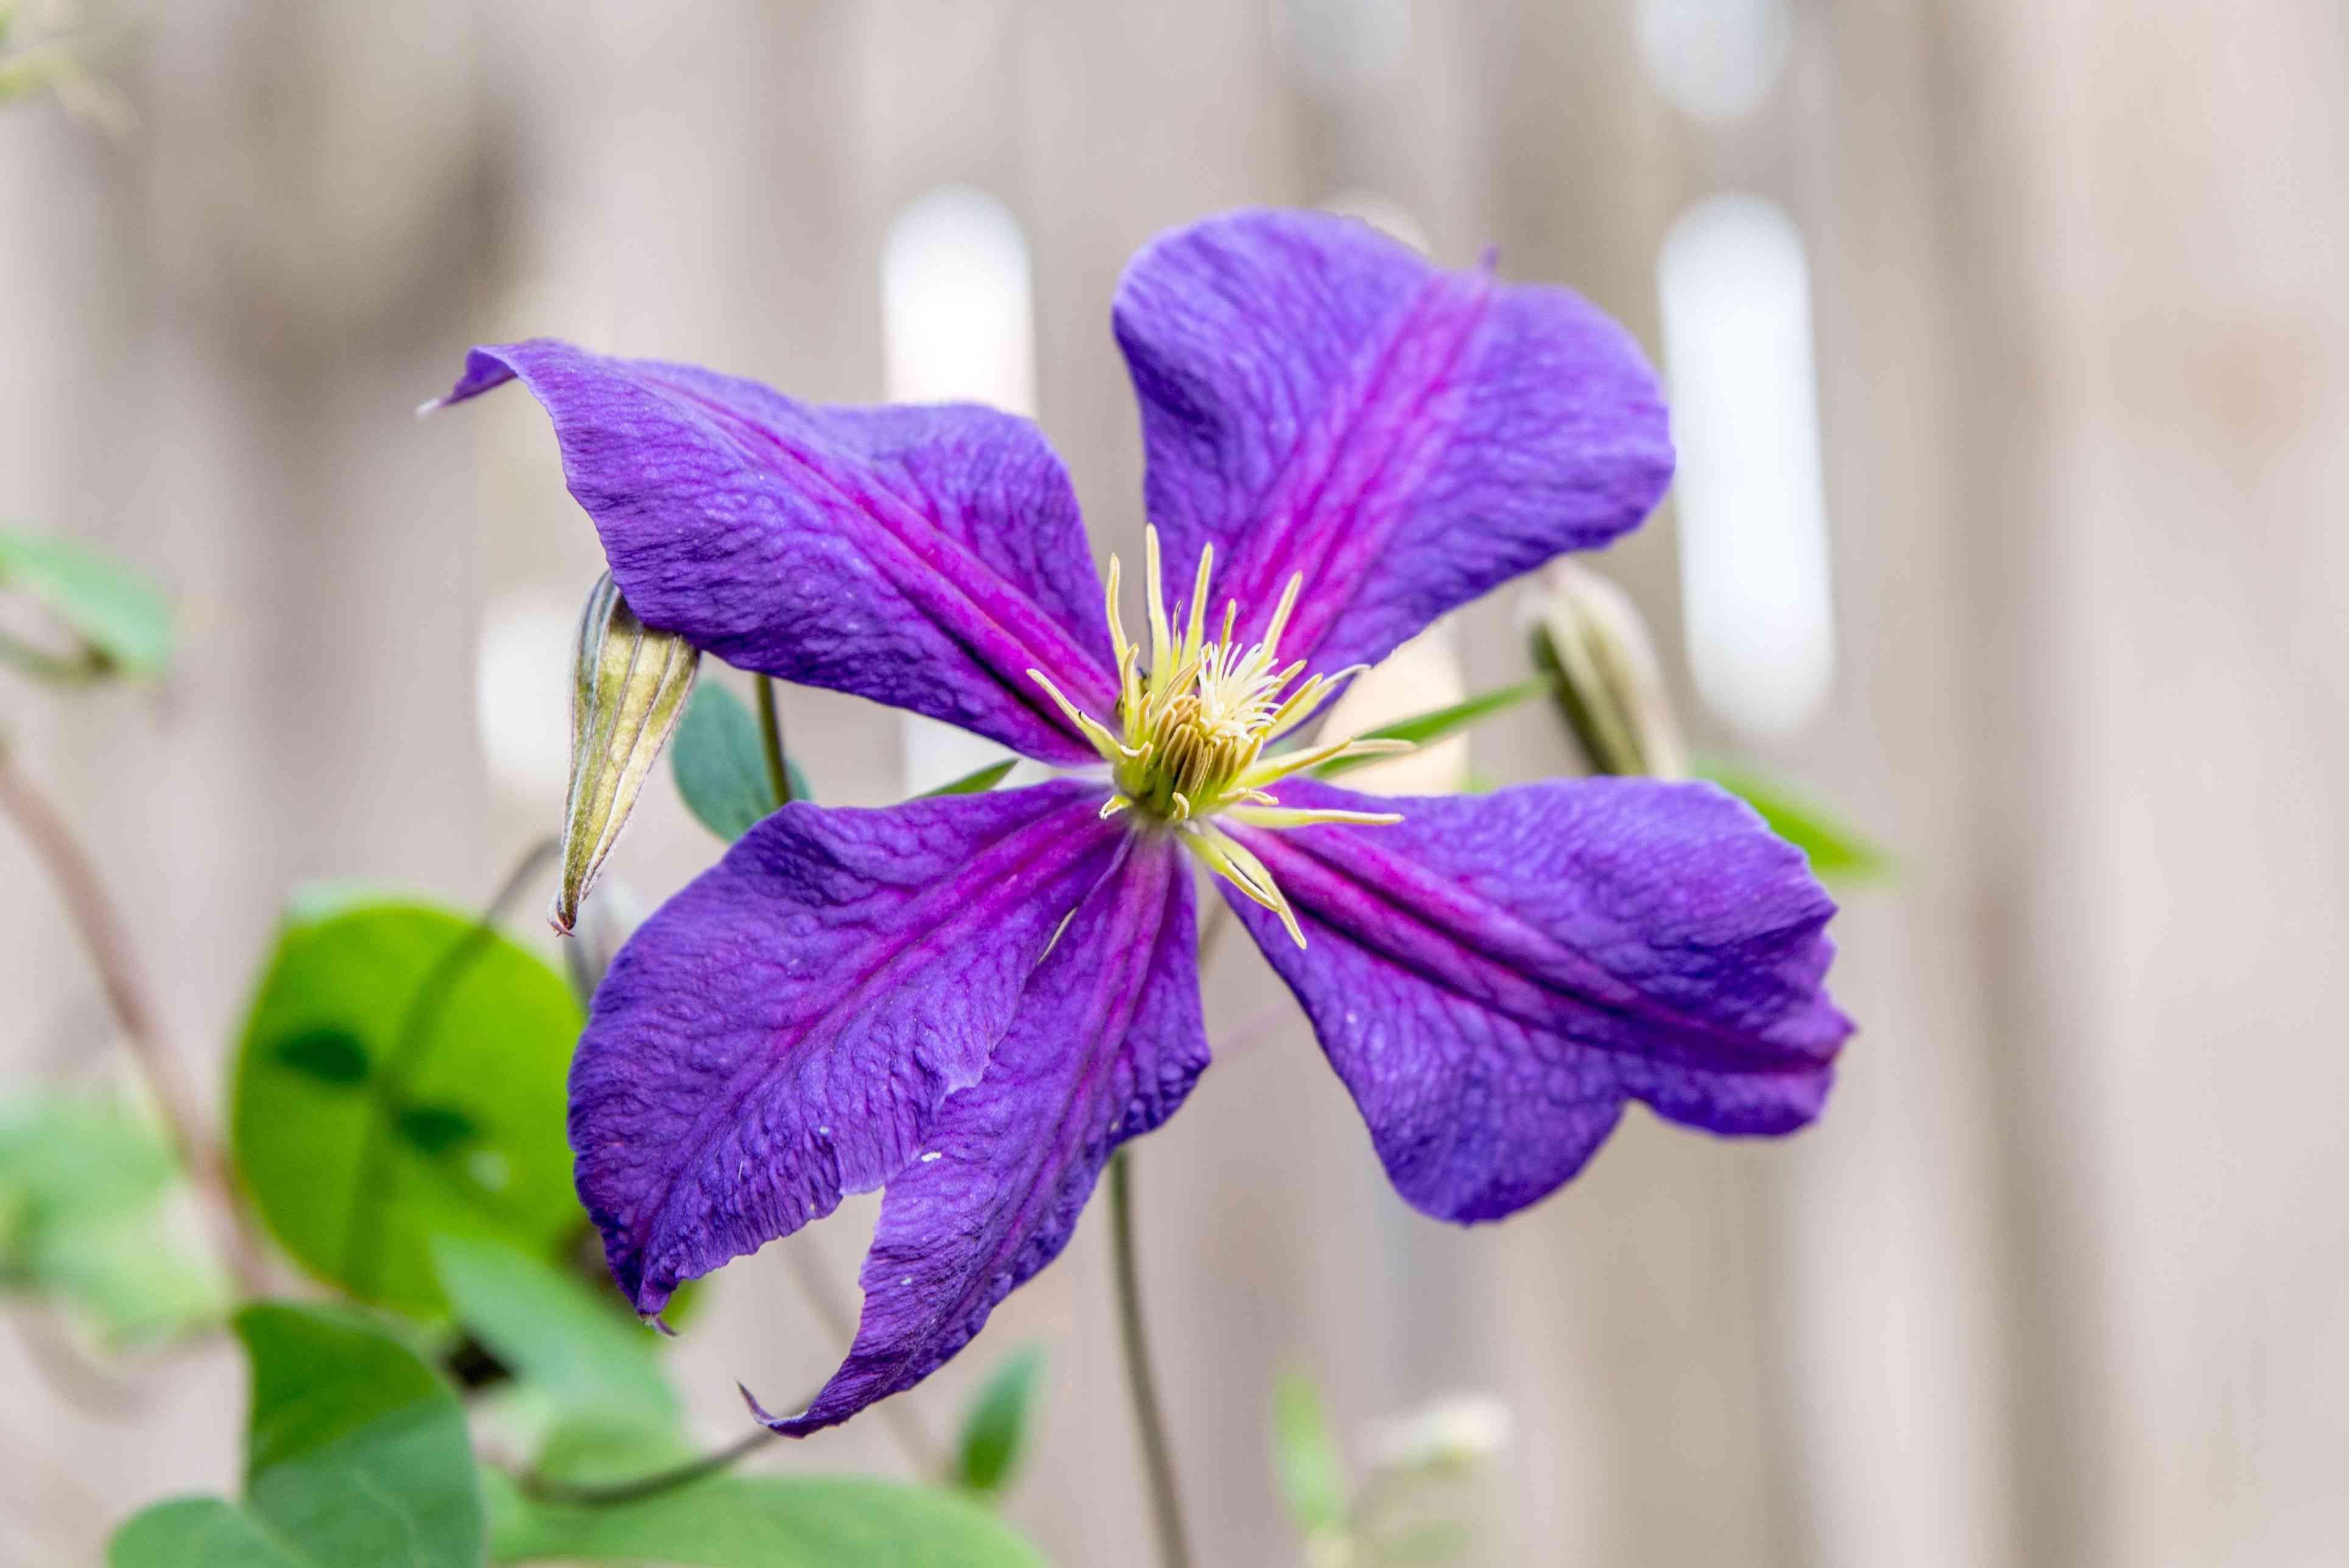 Clematis flower with deep purple colored petals in garden closeup